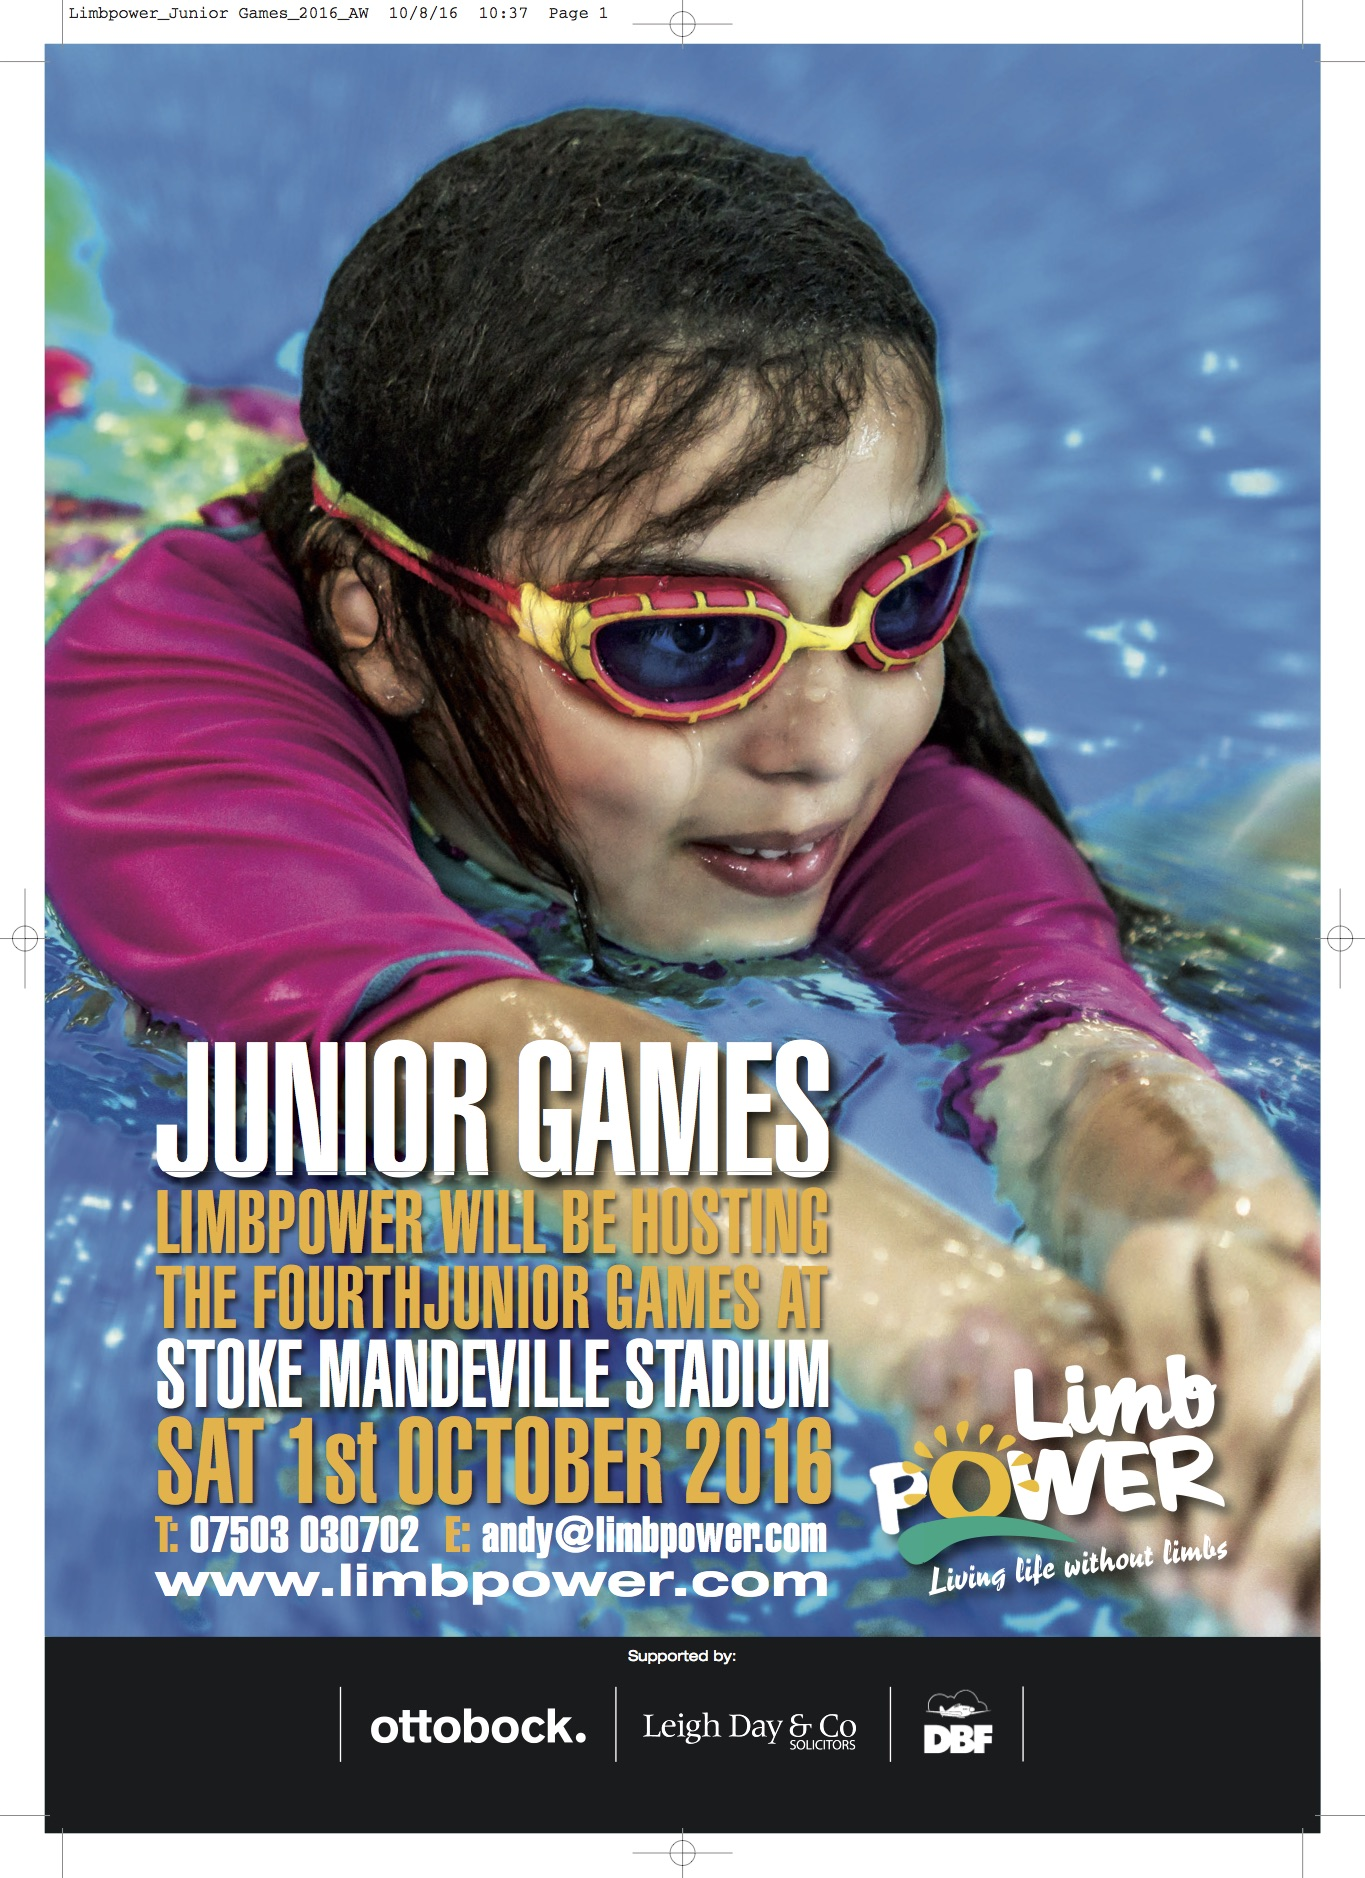 Limbpower_Junior Games_2016_AW A4 2pp (1)